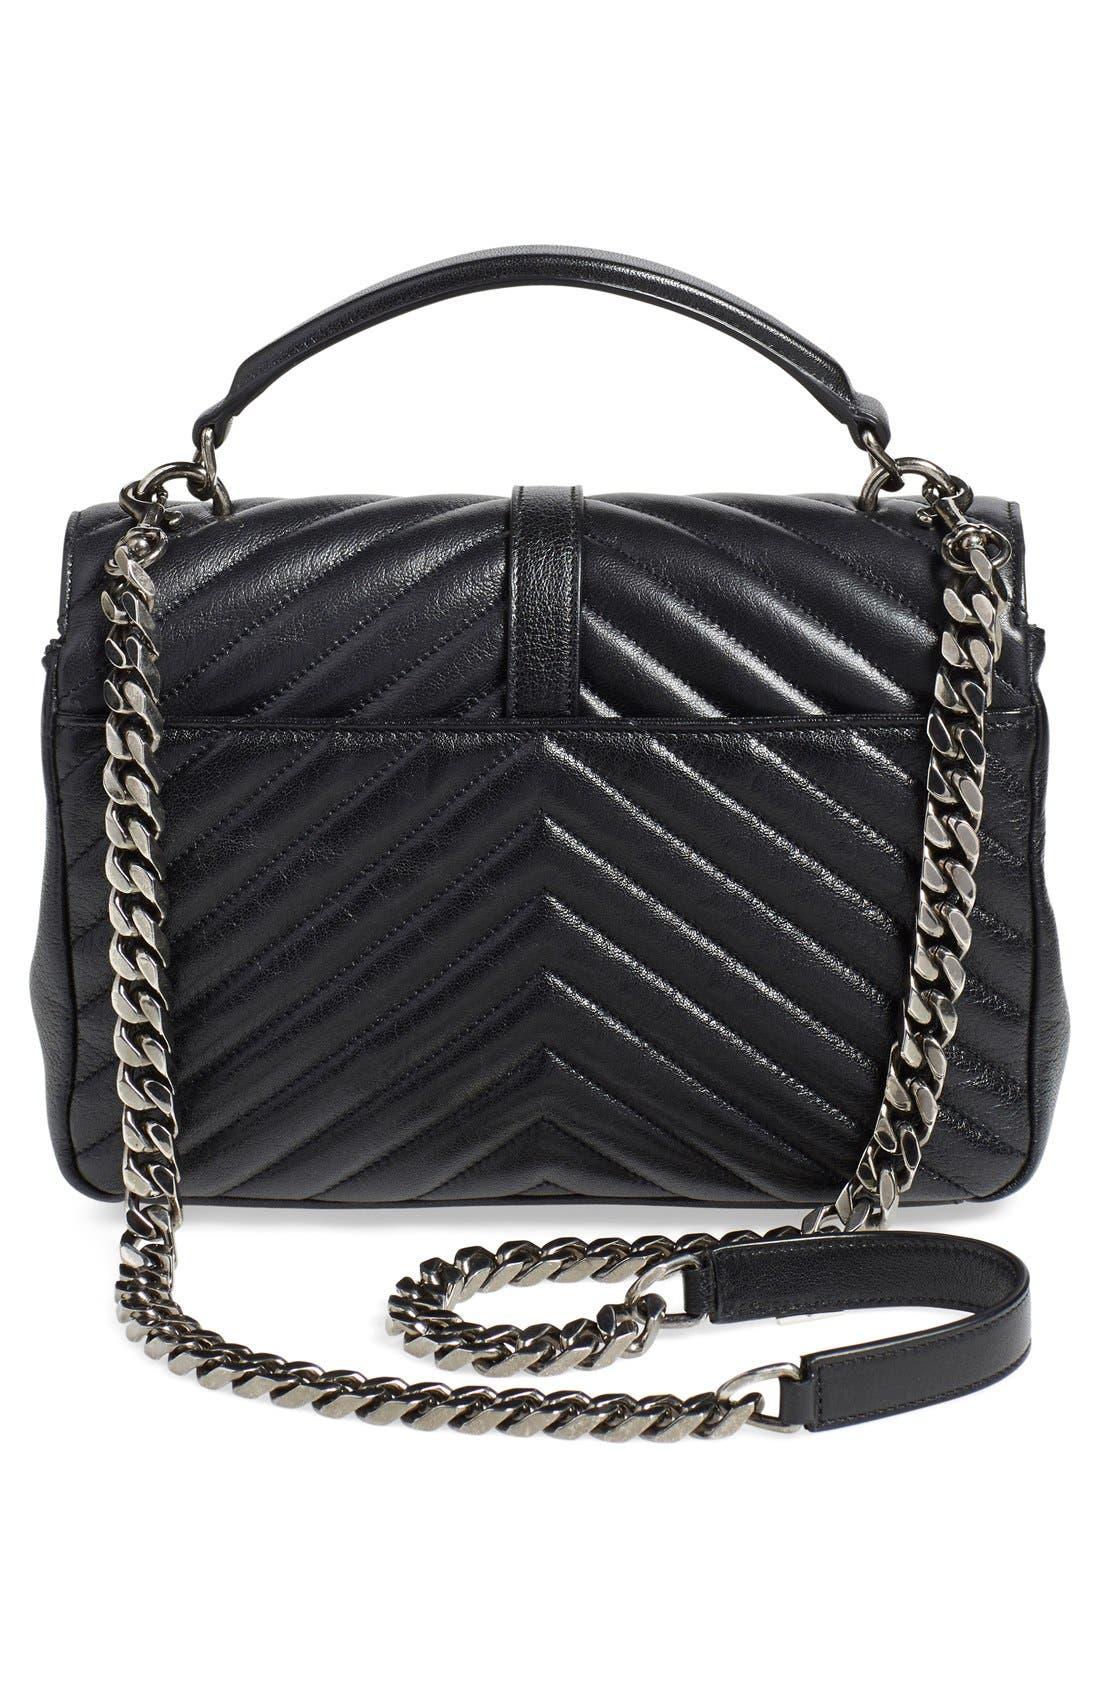 Alternate Image 3  - Saint Laurent 'Medium Monogram' Quilted Leather Shoulder Bag